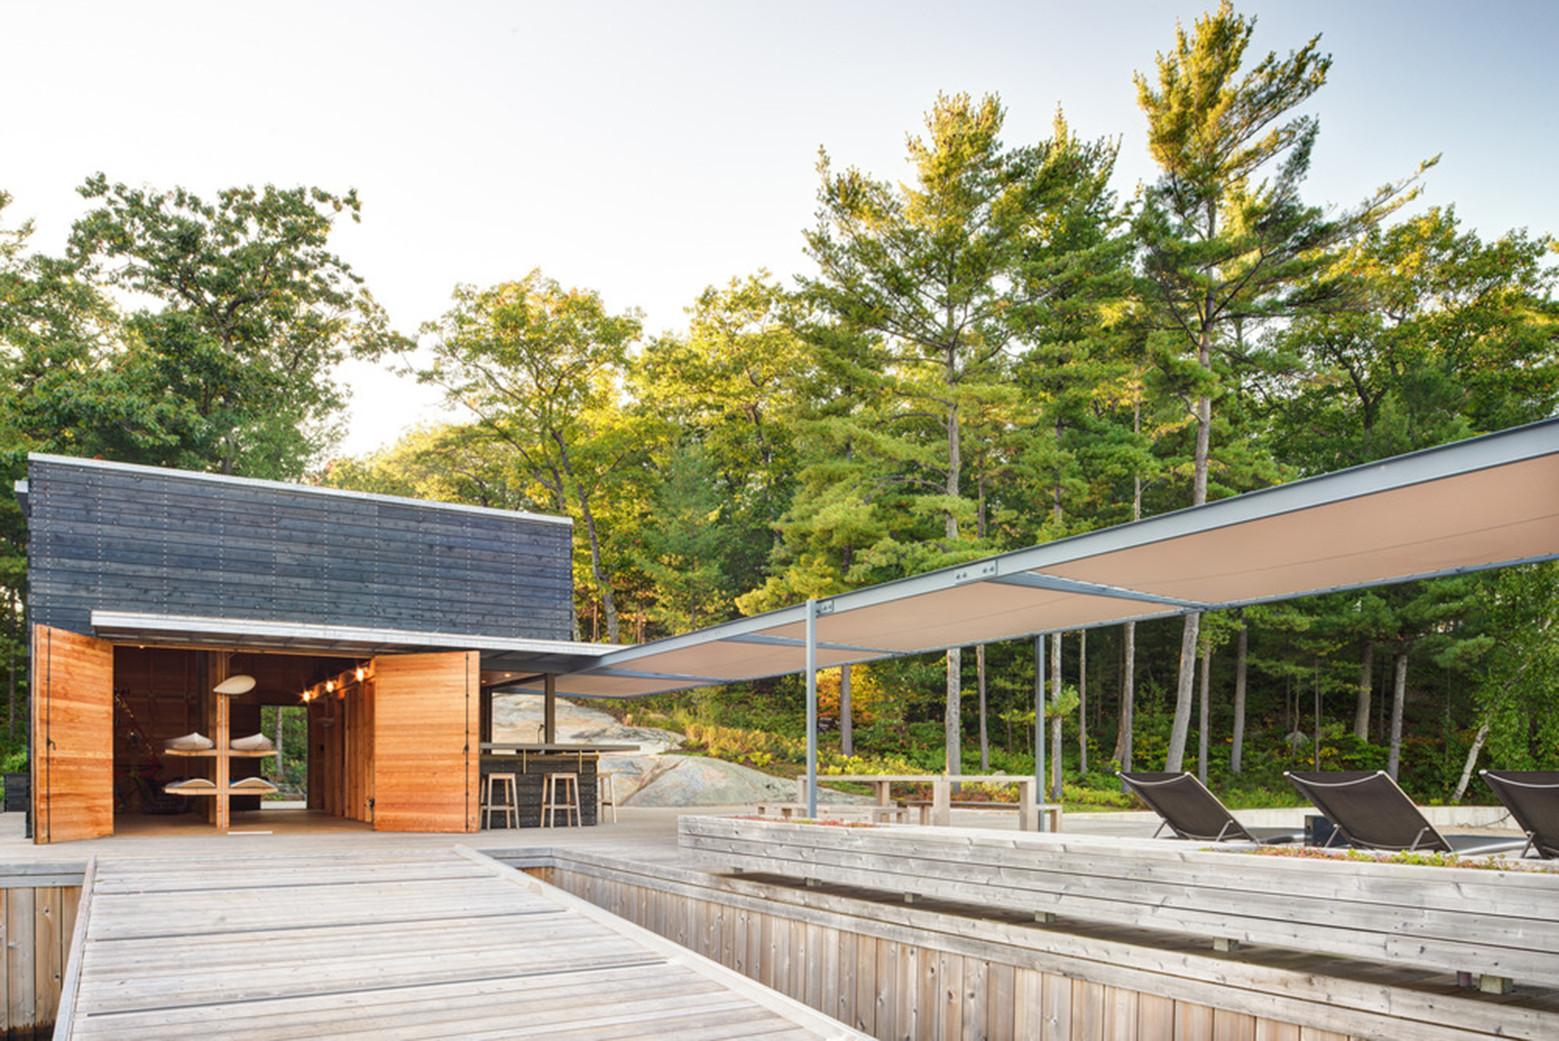 Un cobertizo moderno en el paisaje canadiense / Weiss Architecture & Urbanism Limited, © Arnaud Marthouret